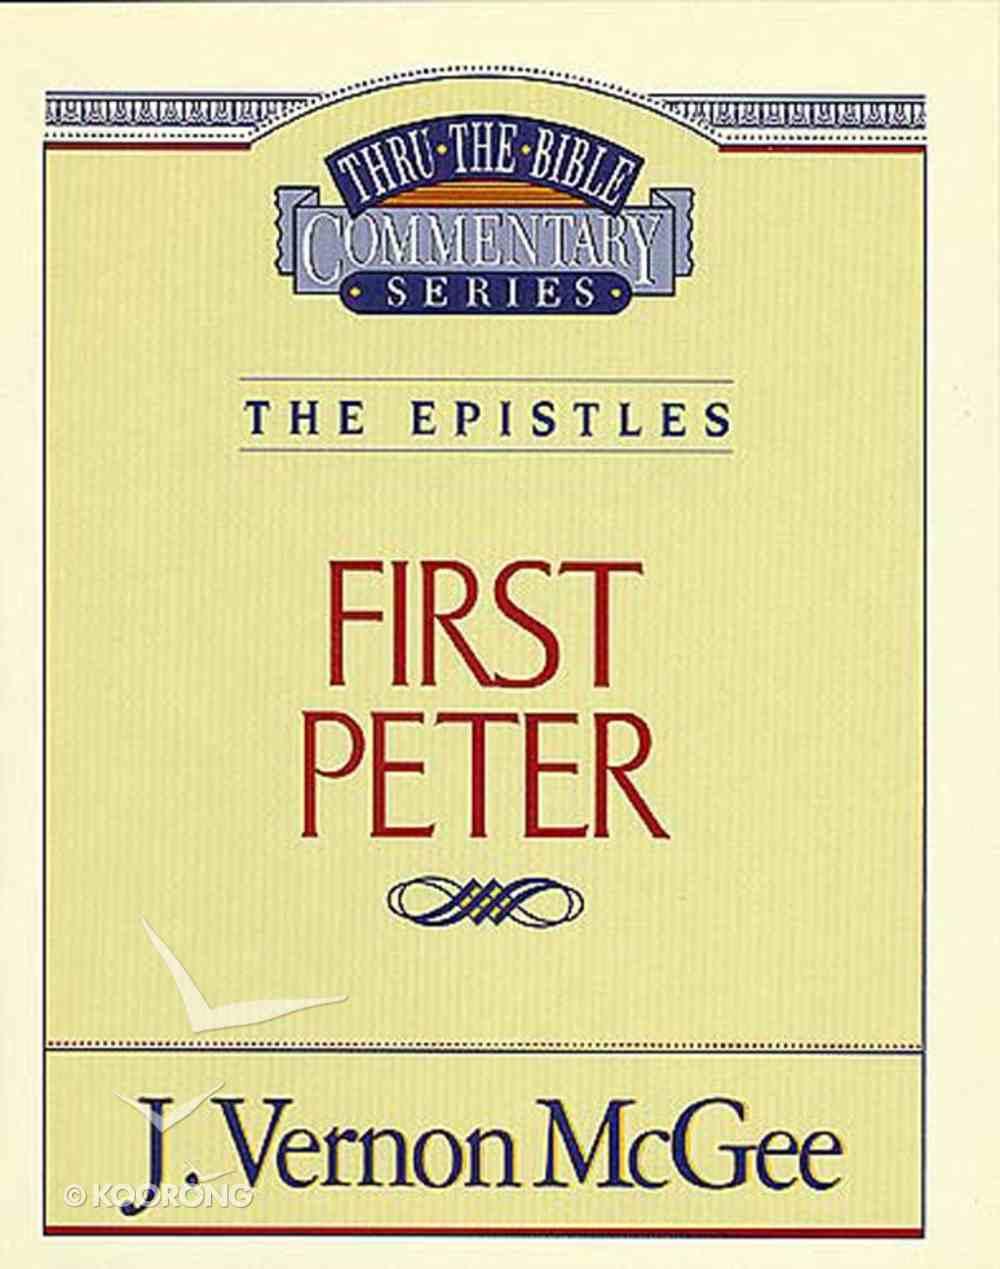 Thru the Bible NT #54: The Epistles (1 Peter) (#54 in Thru The Bible New Testament Series) eBook